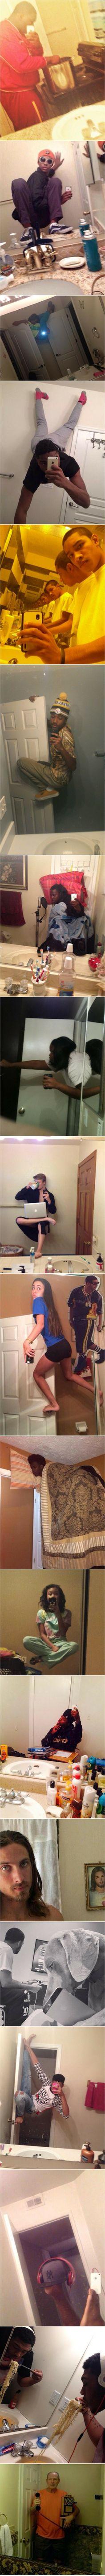 Here are some extreme bathroom selfies that make absolutely no sense. @Emma Zangs Zangs Zangs Z